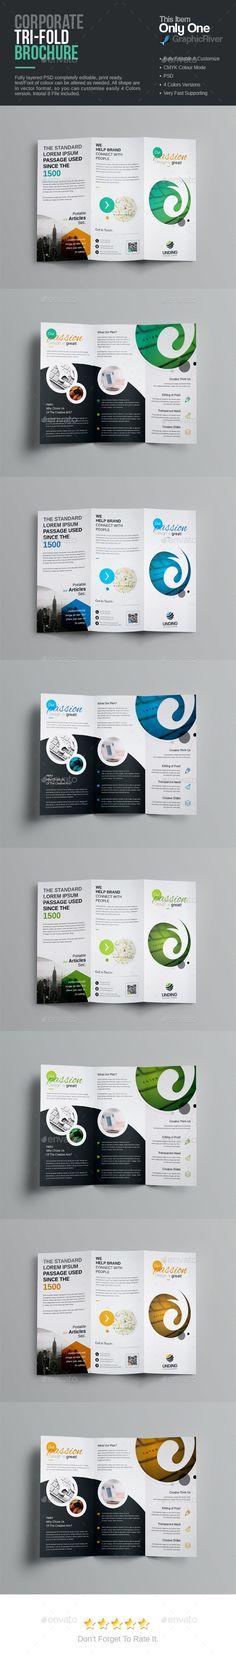 Tri-Fold Brochure - Corporate Brochures Download here : https://graphicriver.net/item/trifold-brochure/19281057?s_rank=99&ref=Al-fatih